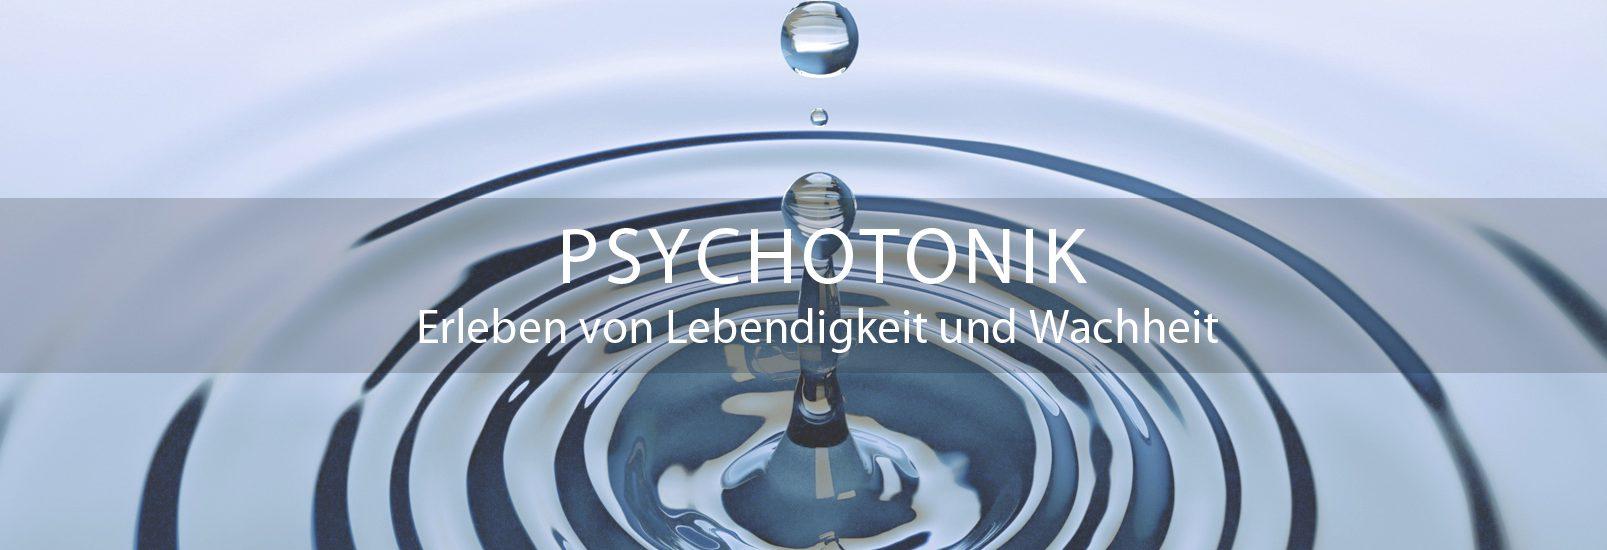 Psychotonik Würzburg Mona Blasek Pschotonik Therapie